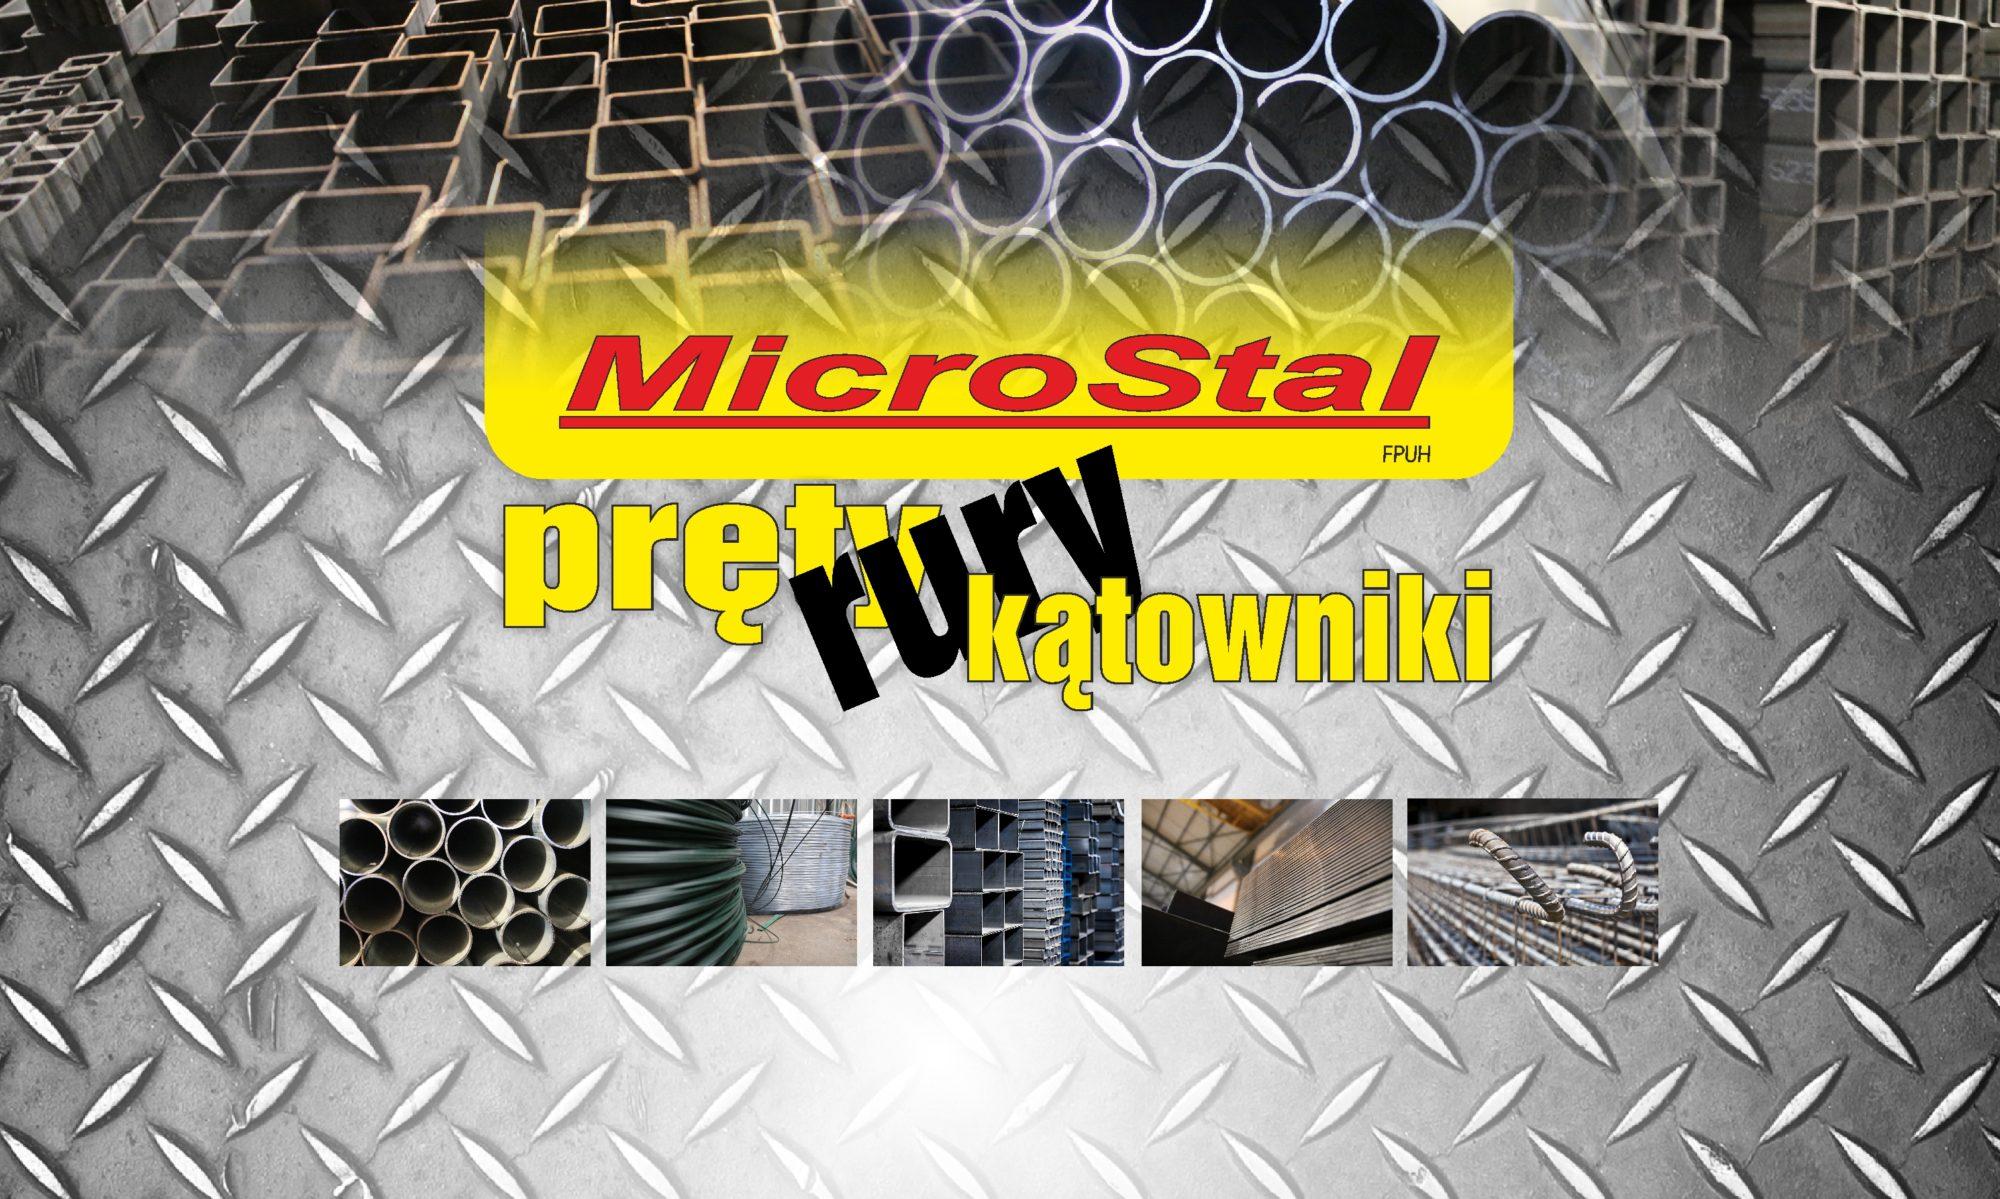 microstal